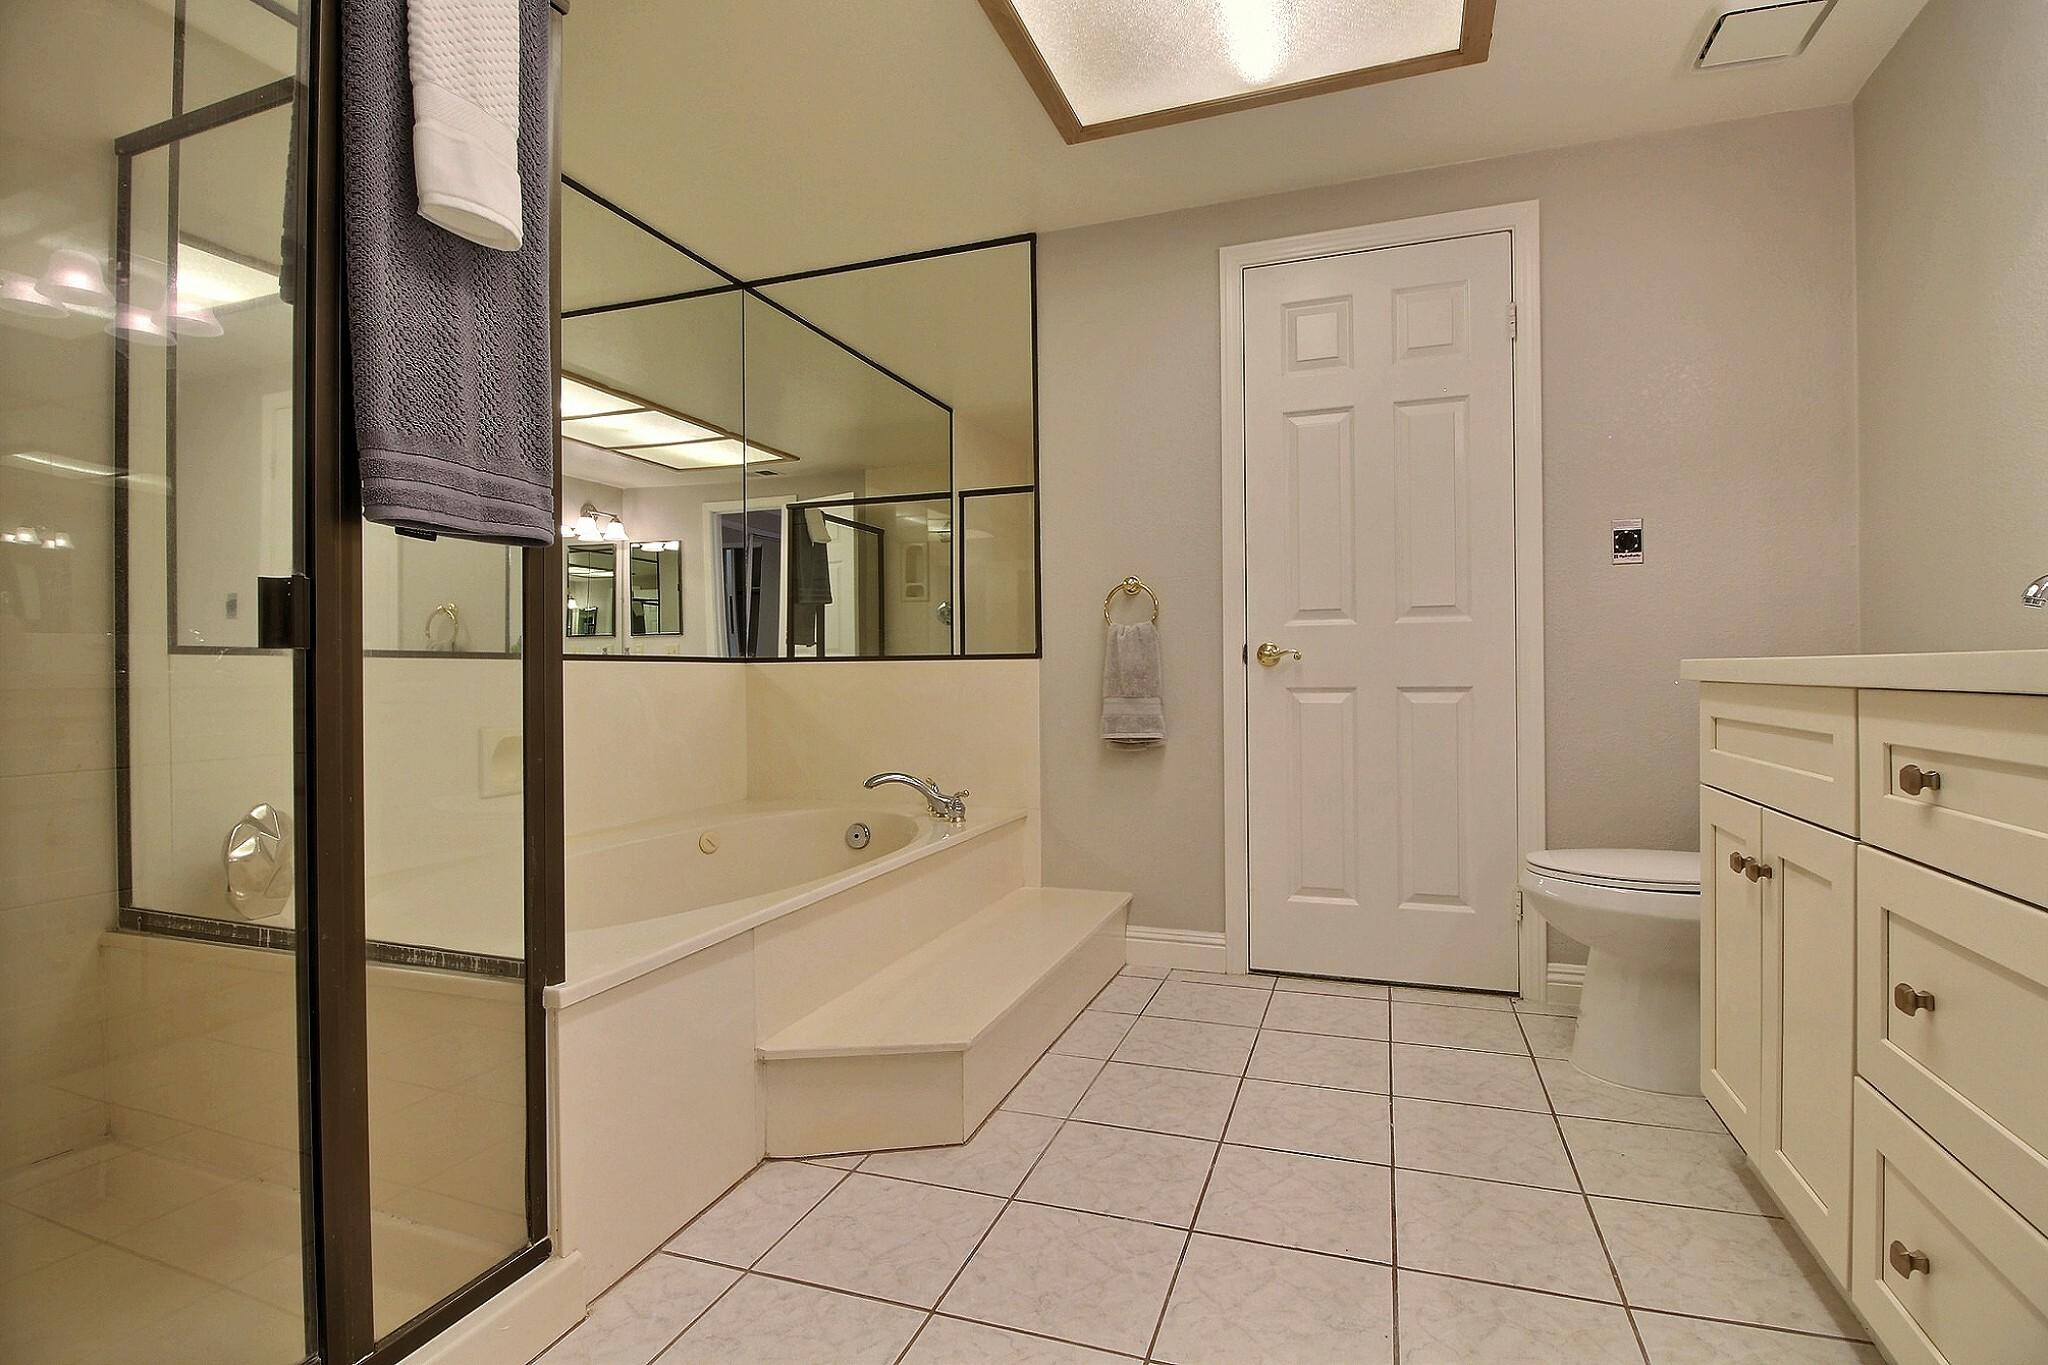 exposio_09_master_bathroom_03_2433_wildhorse_